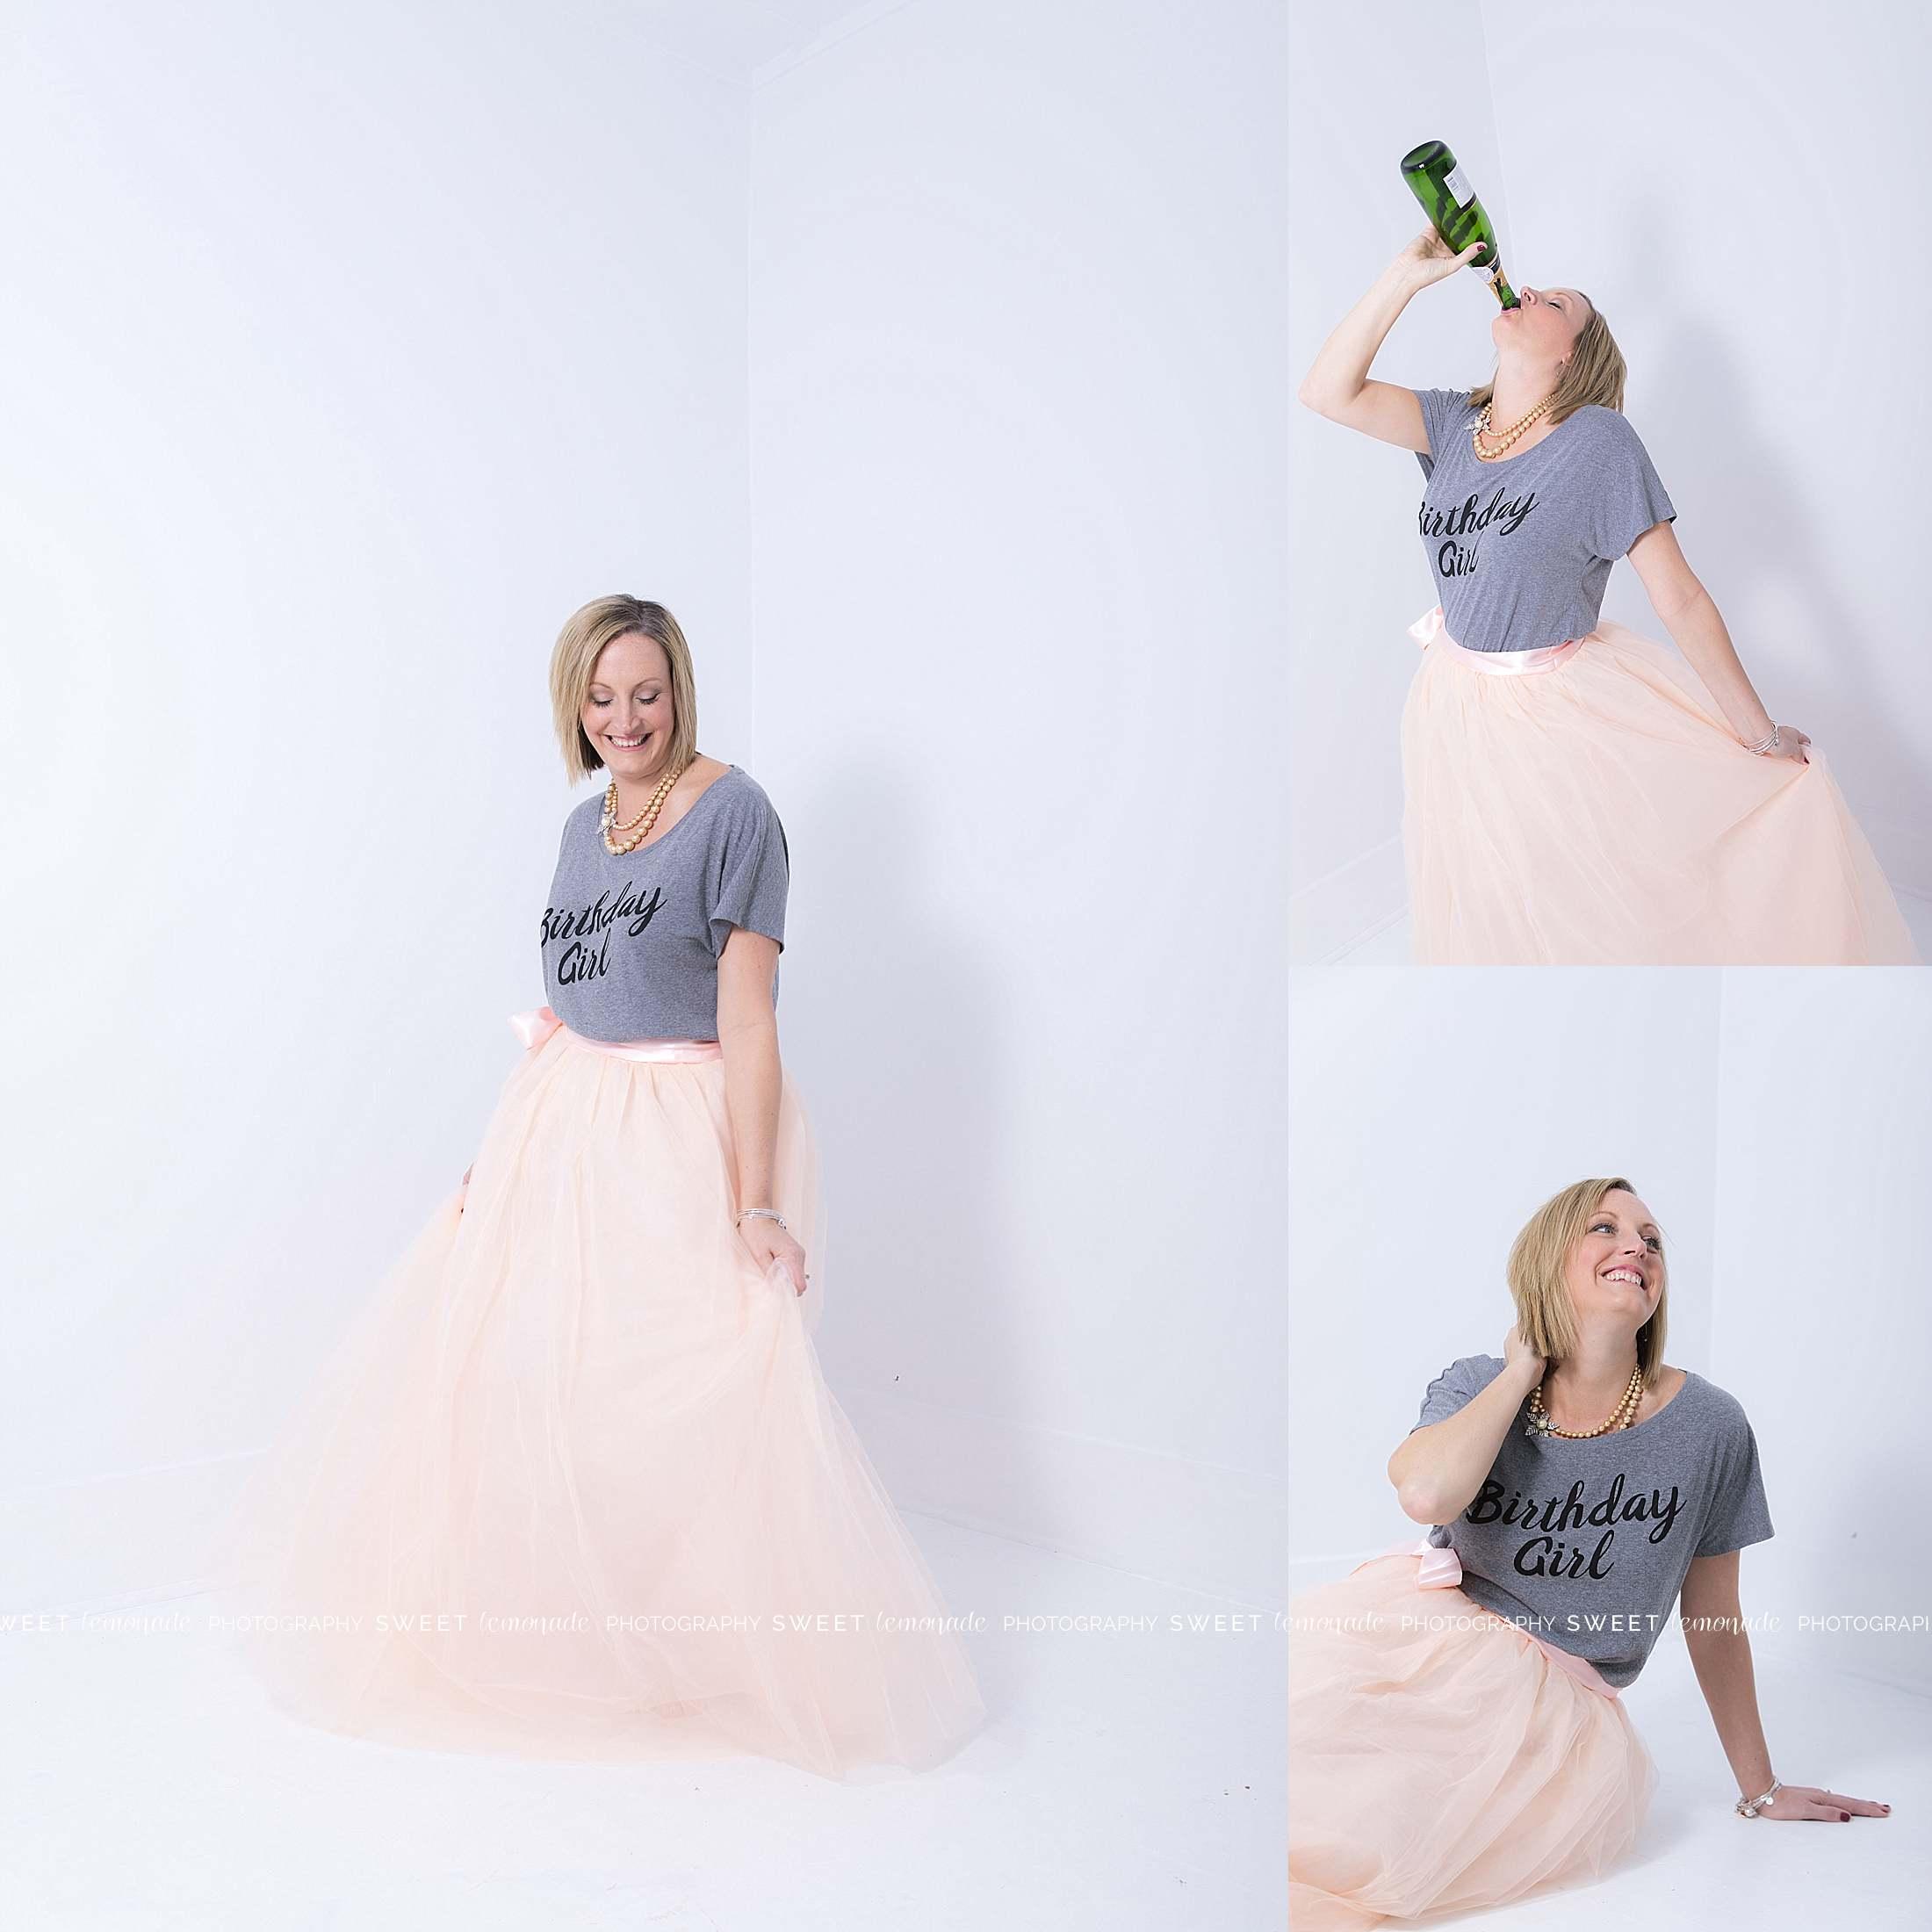 40-year-old-woman-birthday-girl-tshirt-peach-tulle-skirt-_1919.jpg